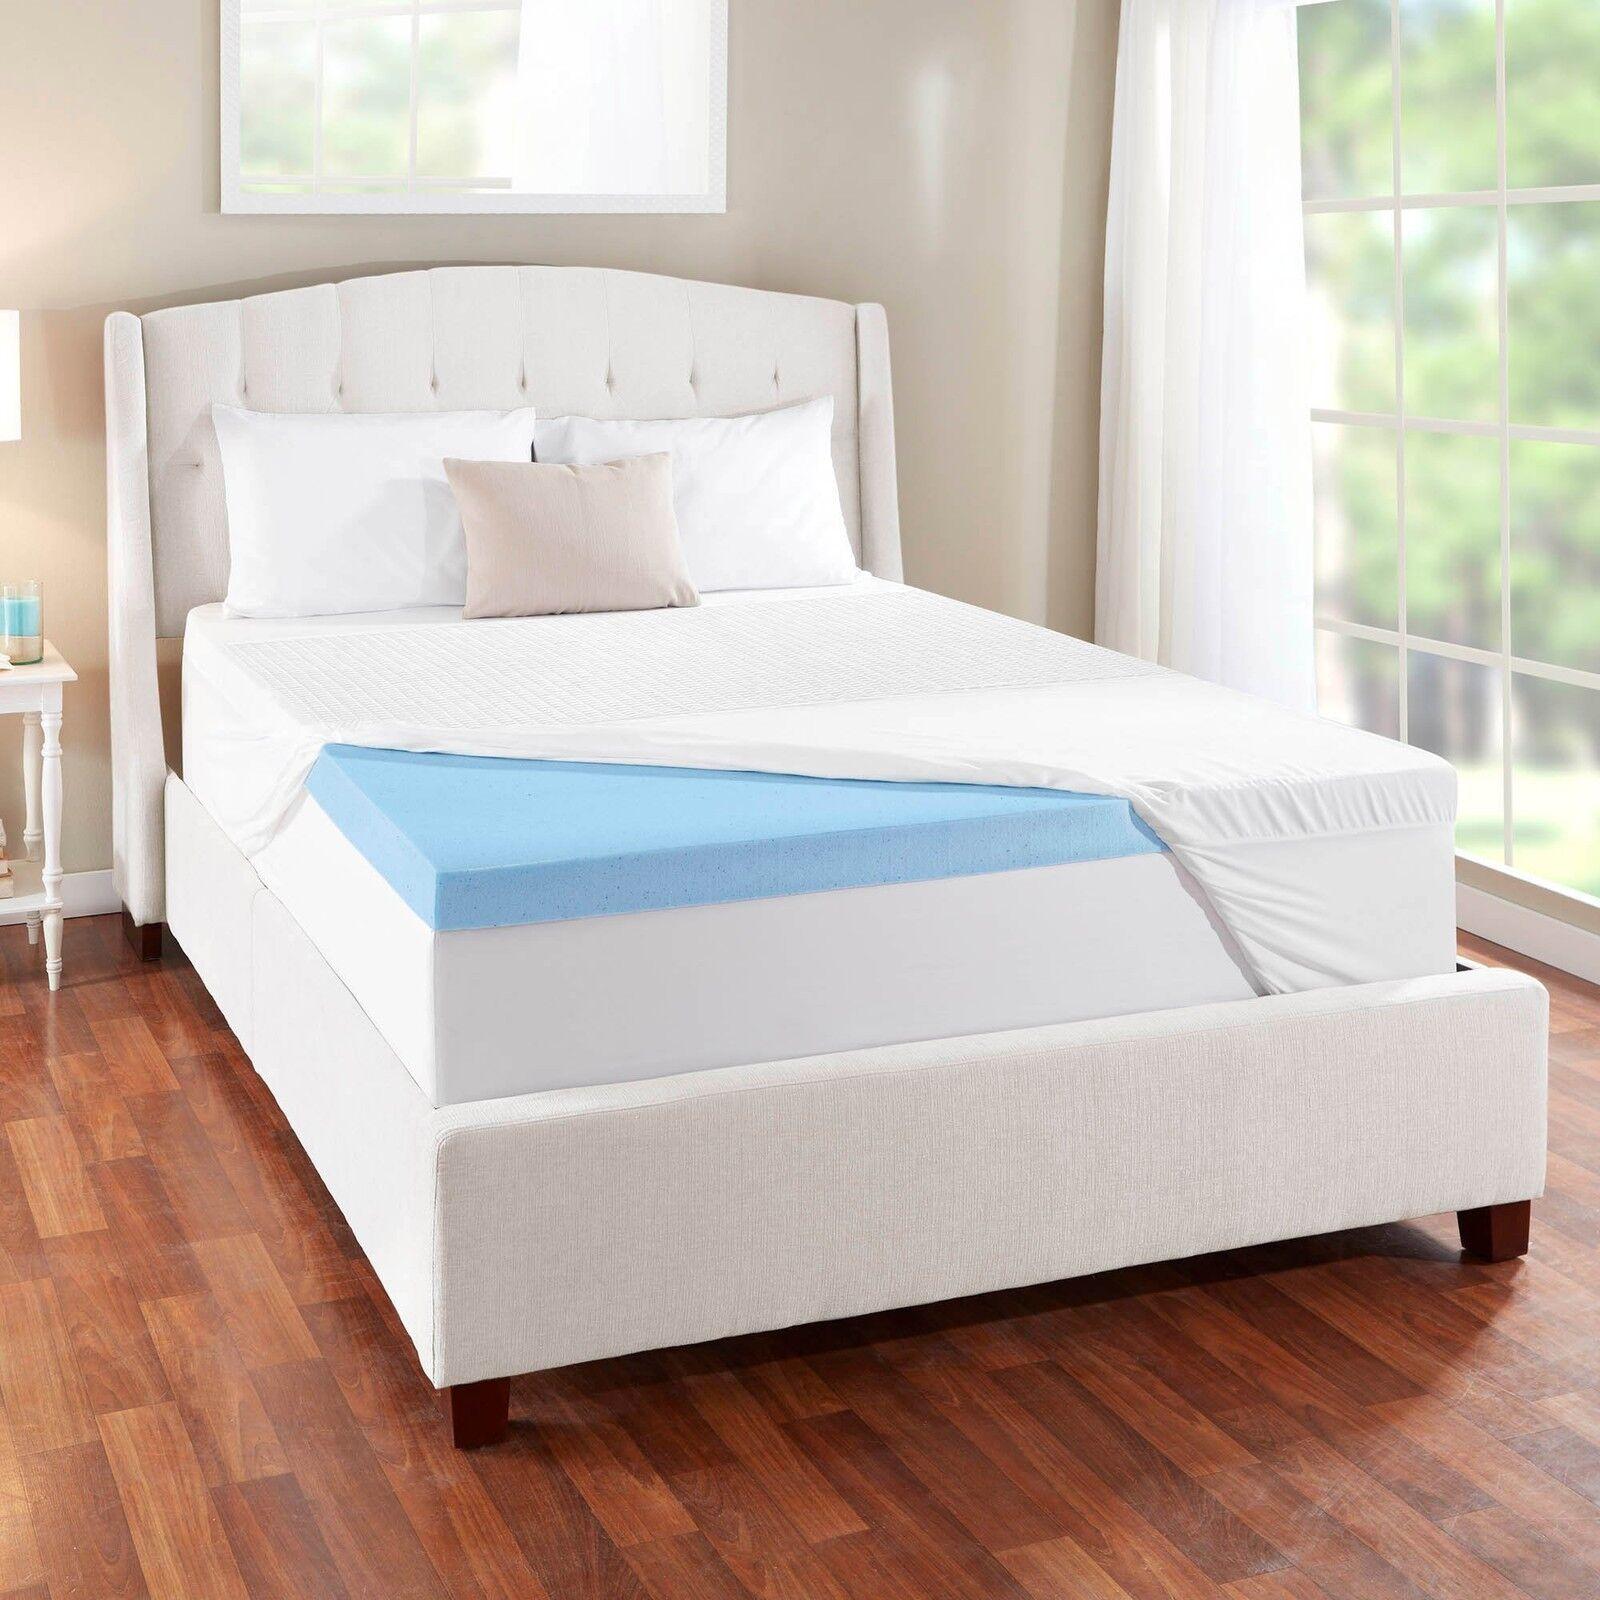 King size memory foam mattress ebay headboards for divan for King size divan bed with memory foam mattress